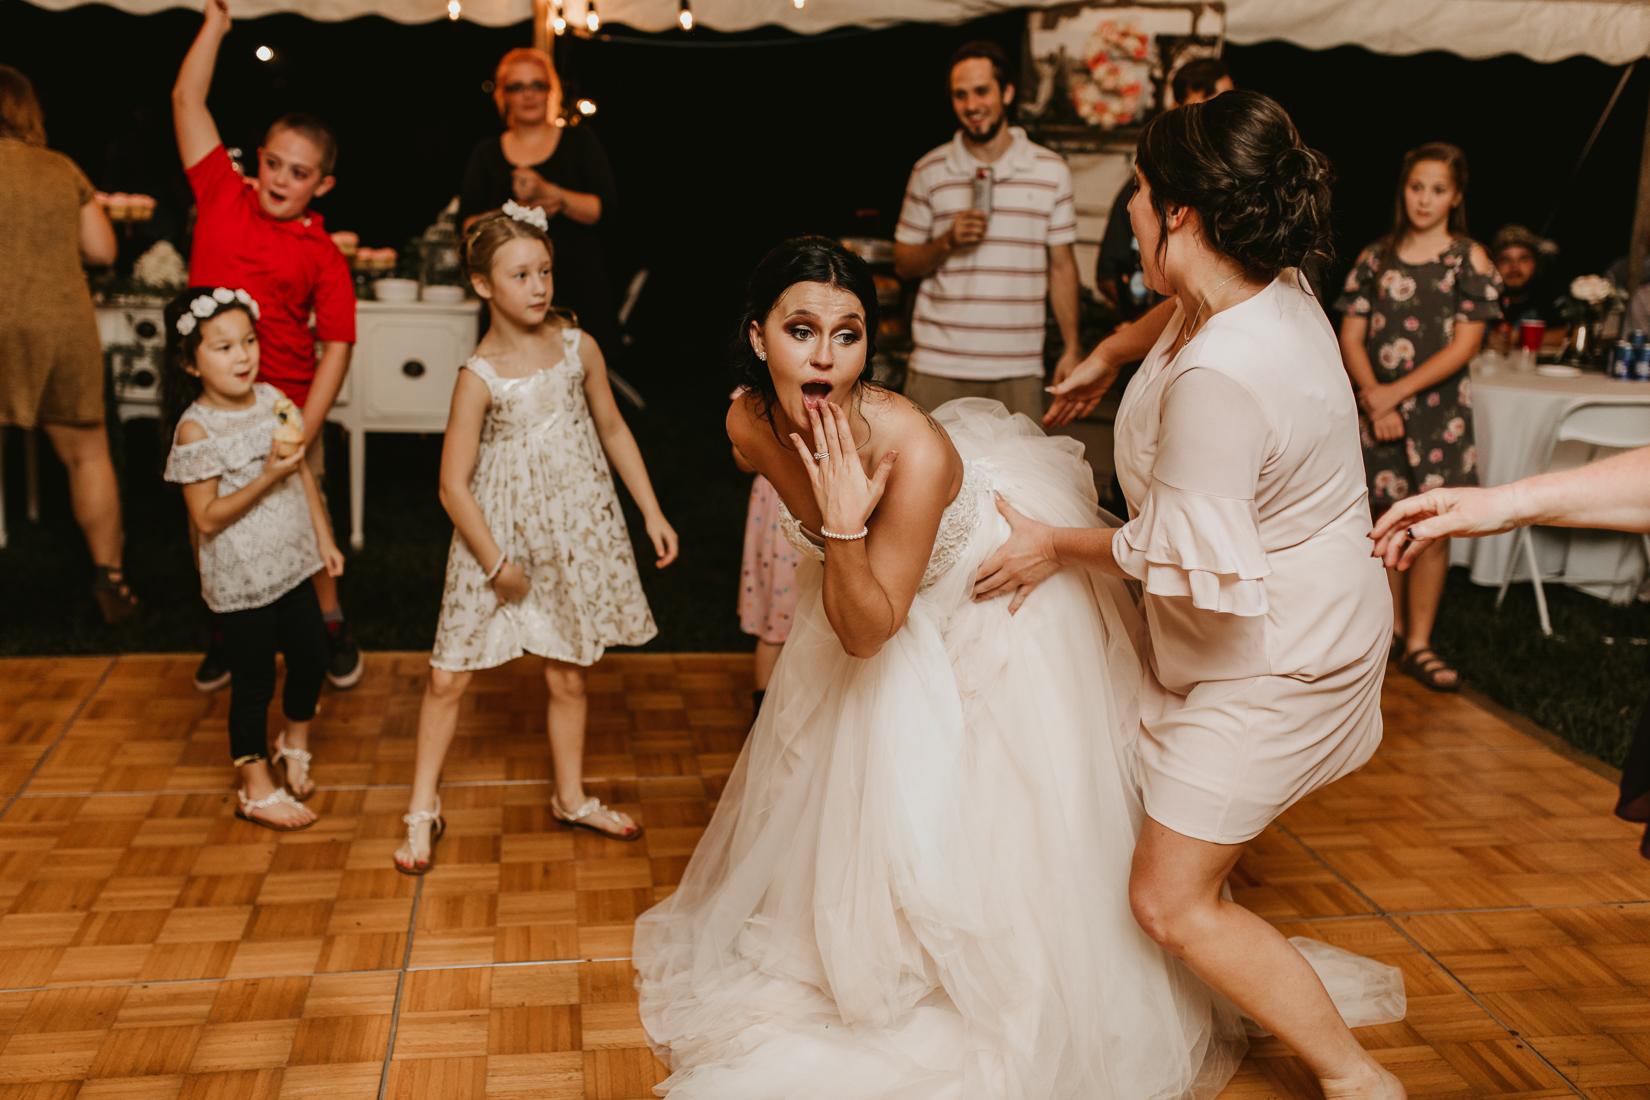 olivia_zay_wedding_09_2018-9169.jpg